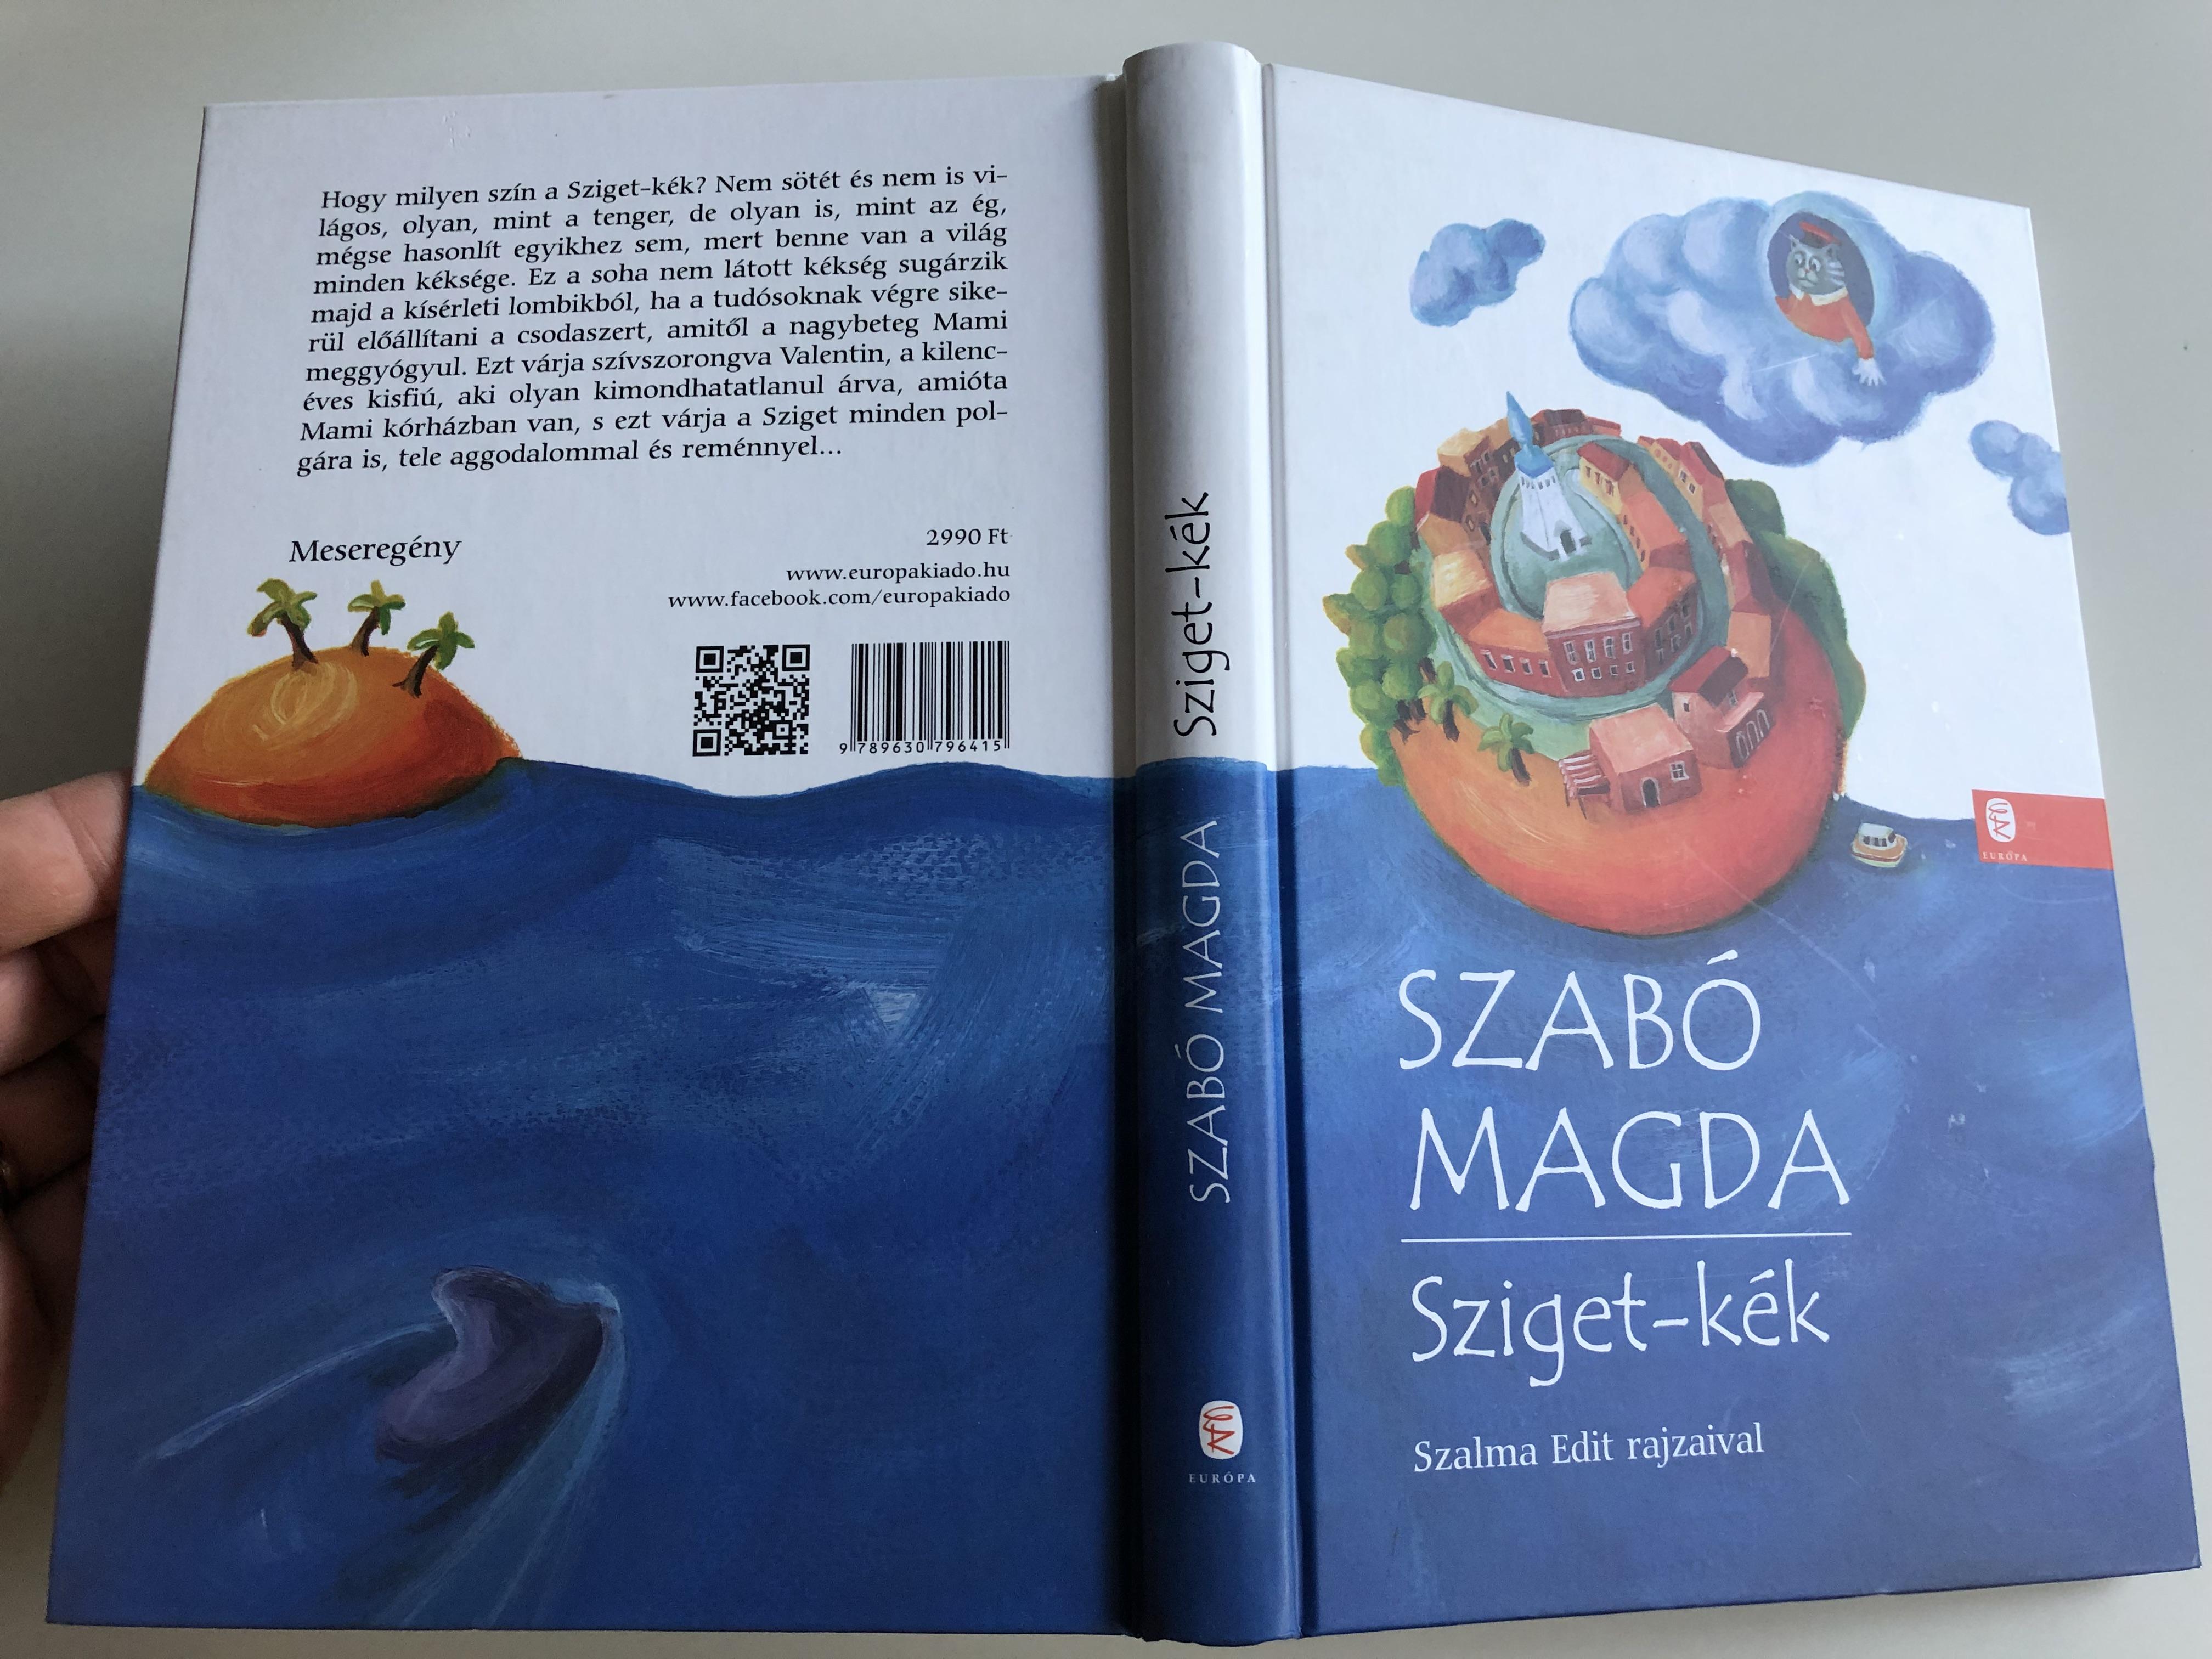 sziget-k-k-by-szab-magda-island-blue-hungarian-novel-for-children-szalma-edit-rajzaival-eur-pa-k-nyvkiad-2013-12-.jpg